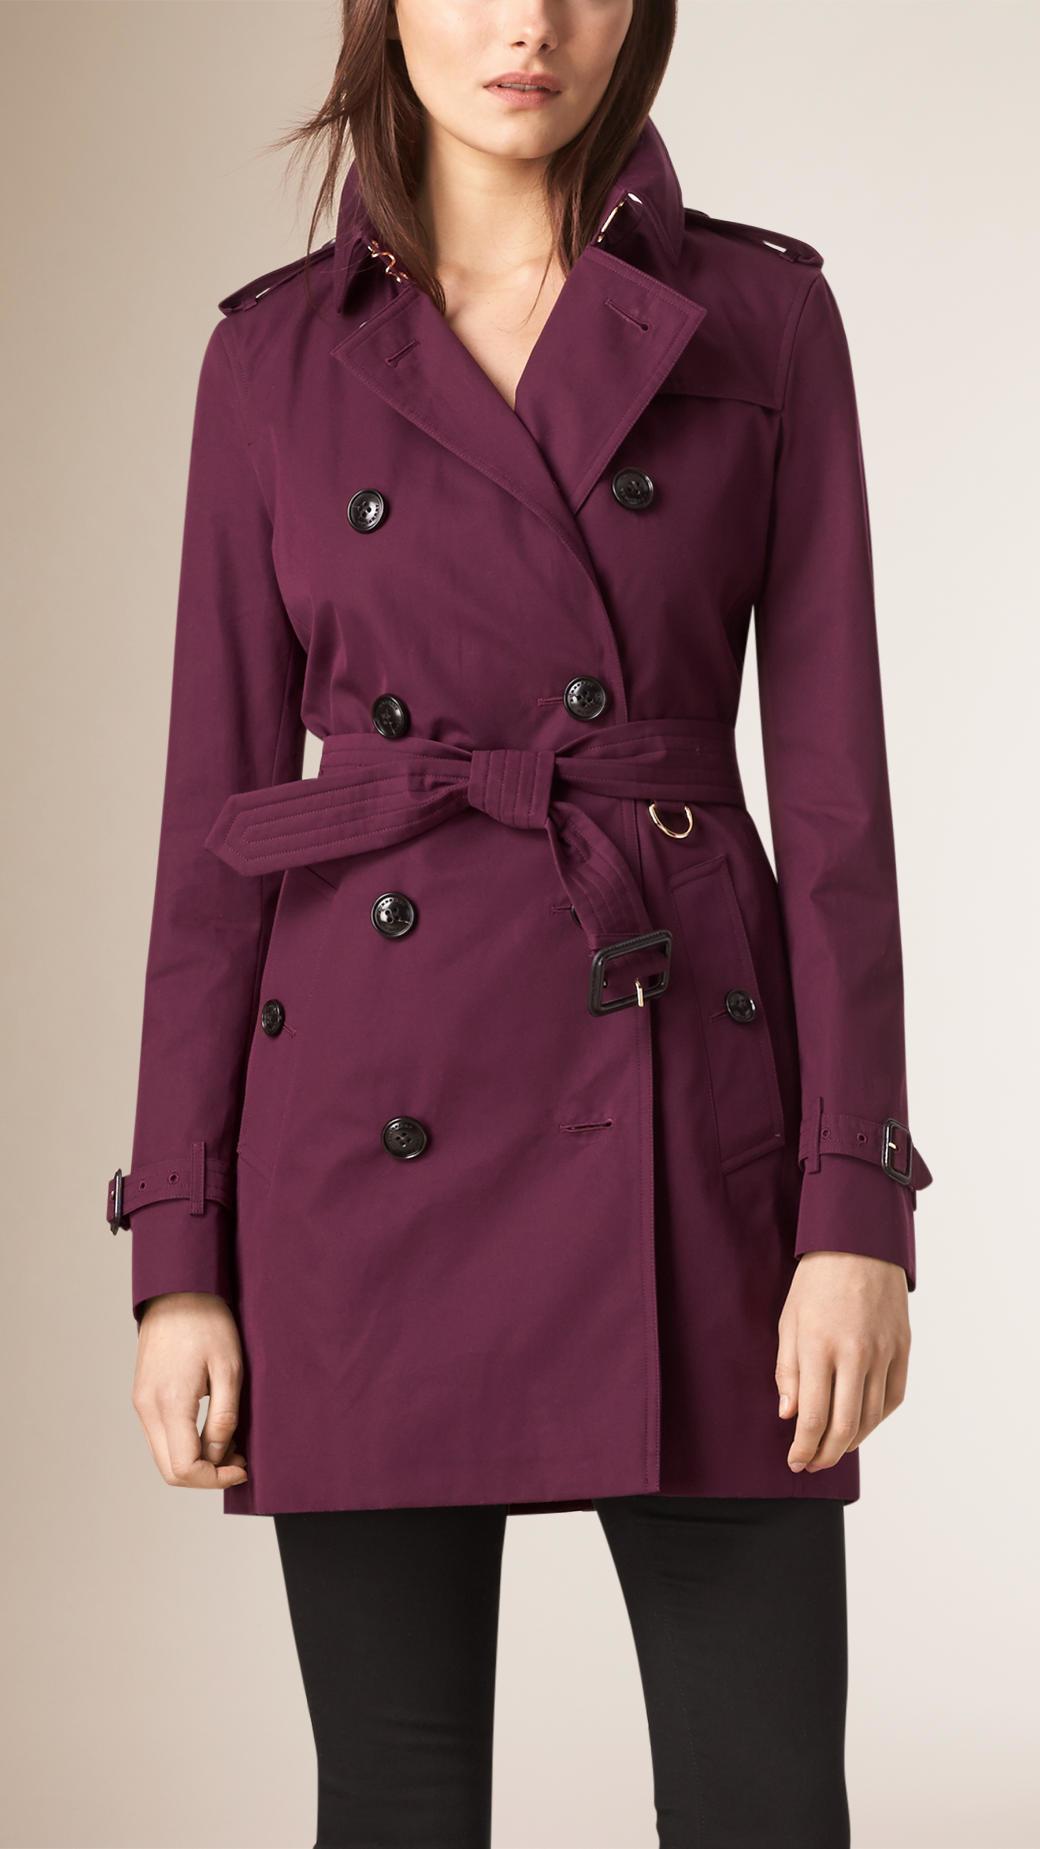 Burberry Lightweight Cotton Gabardine Trench Coat in ...